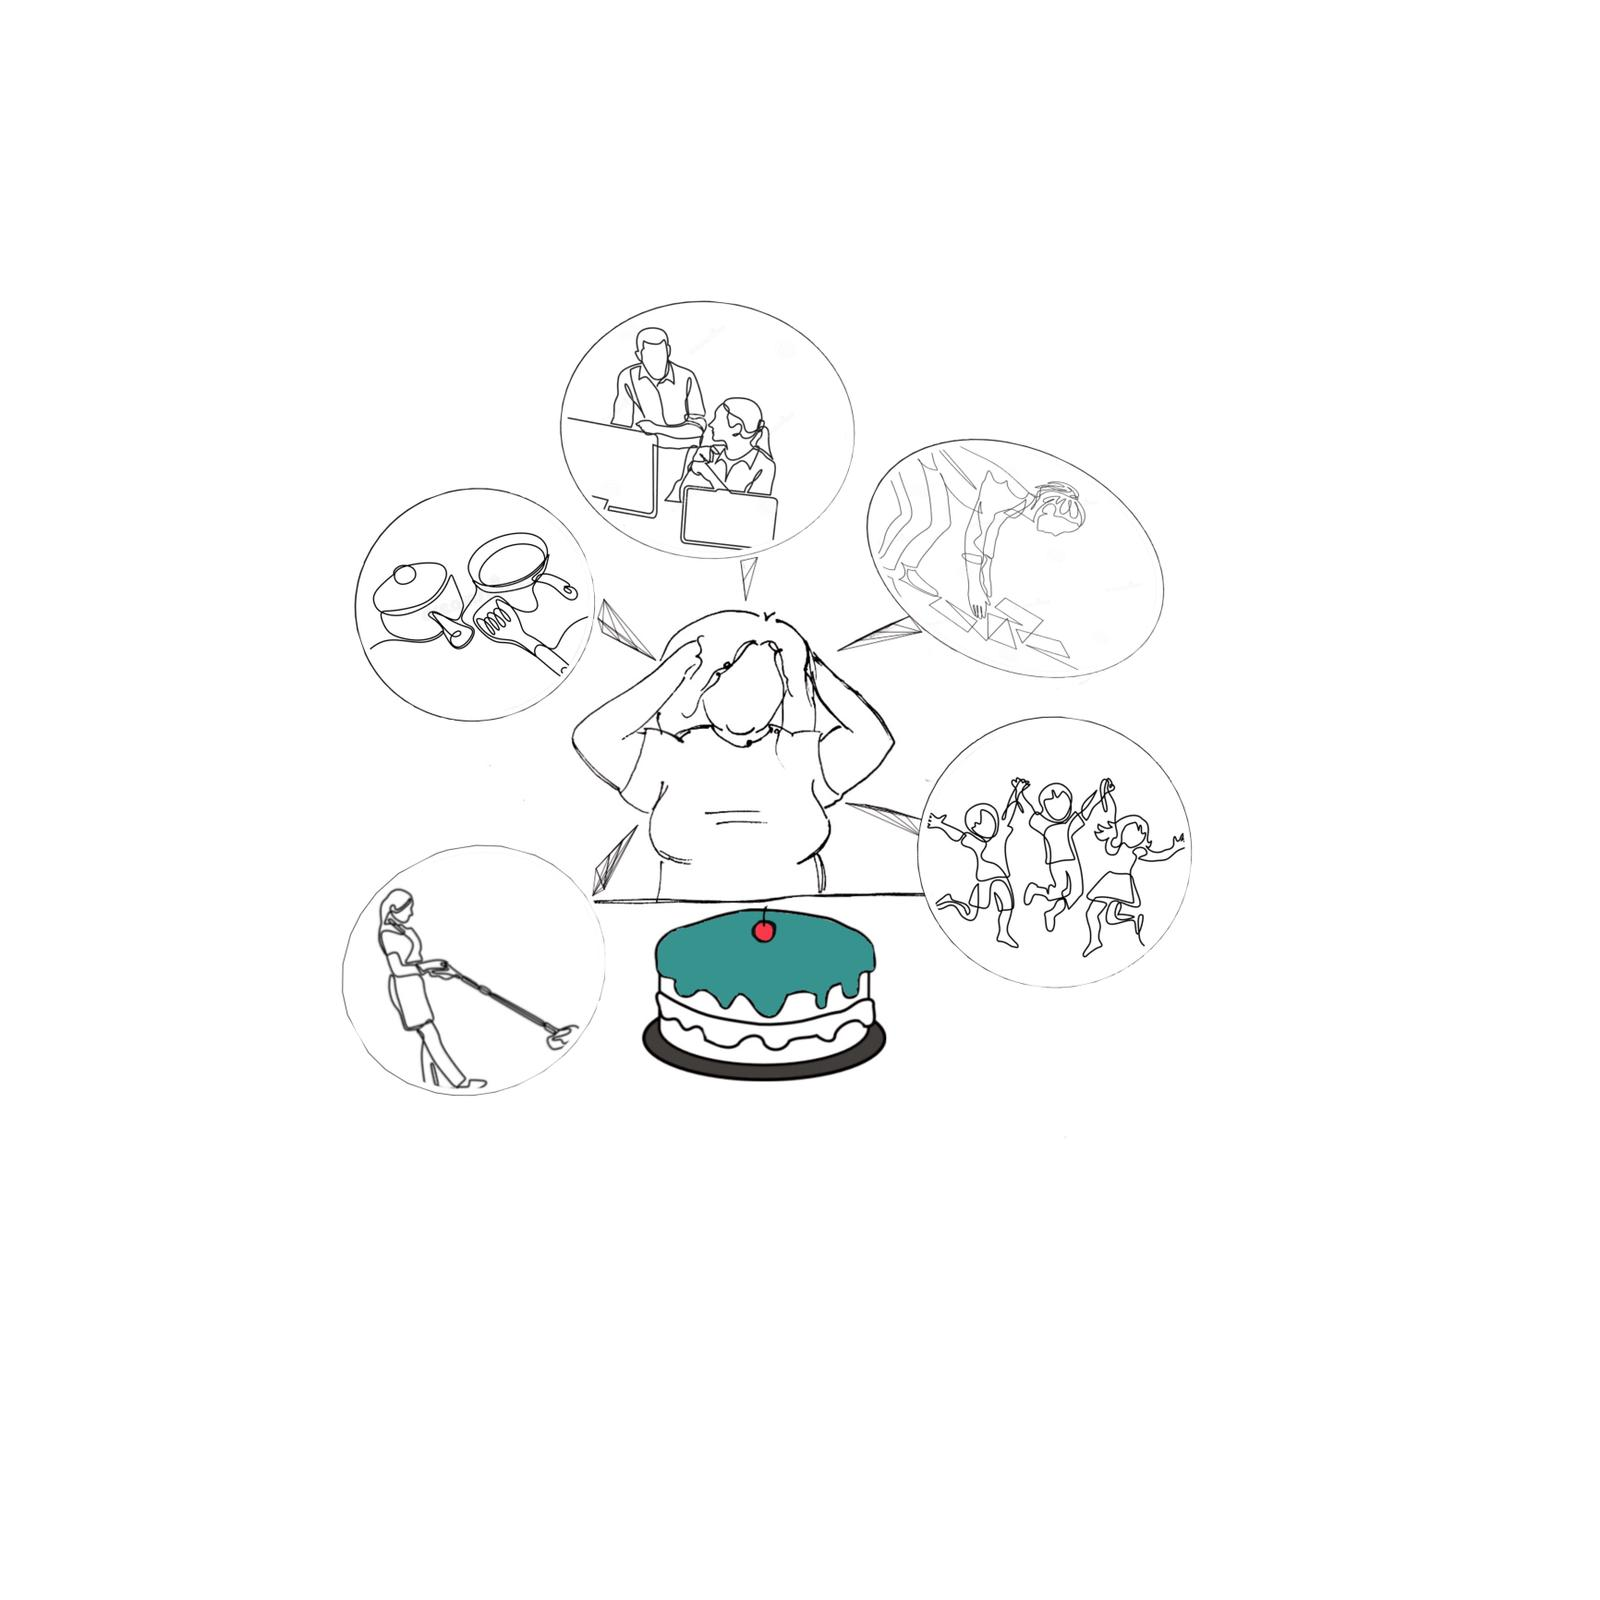 Dieta-chetogenica-Marika-donna-in-carriera